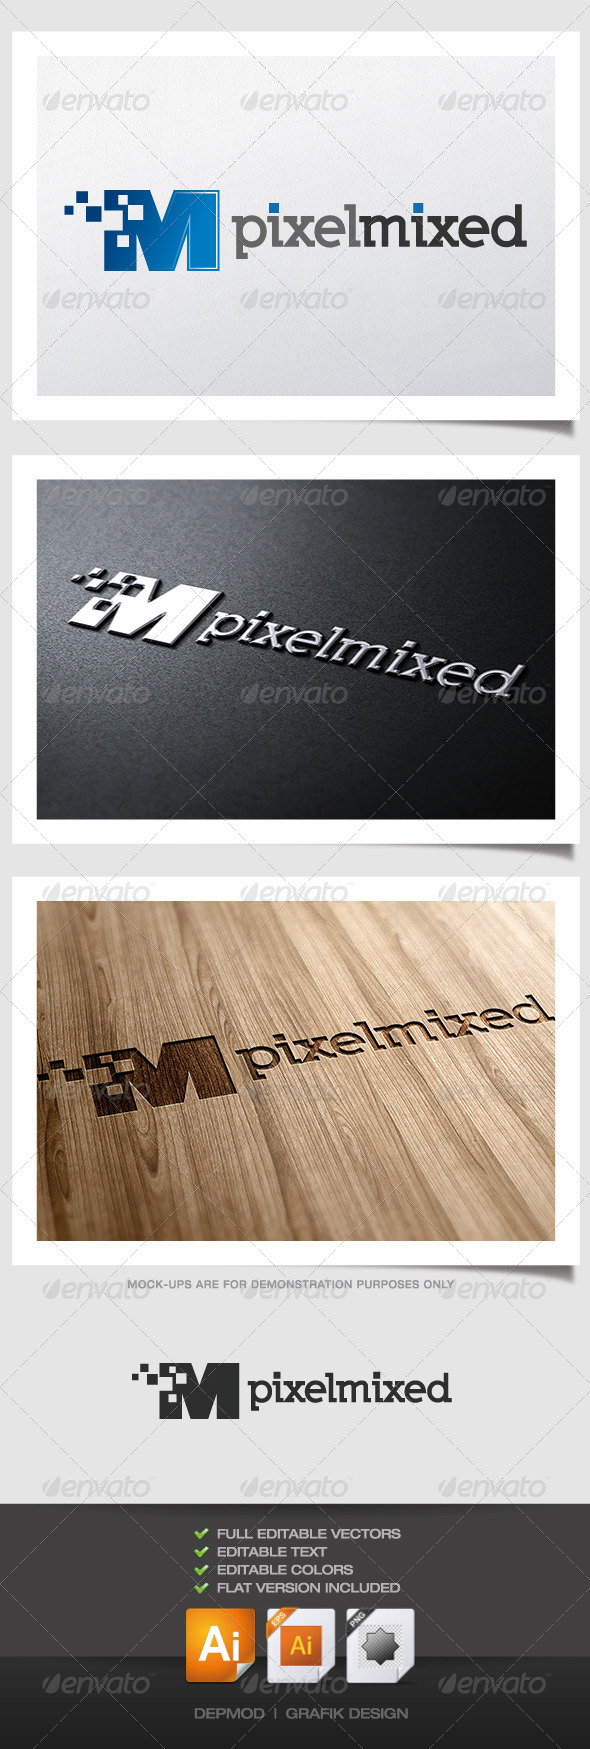 GraphicRiver Pixel Mixed Logo 4320544